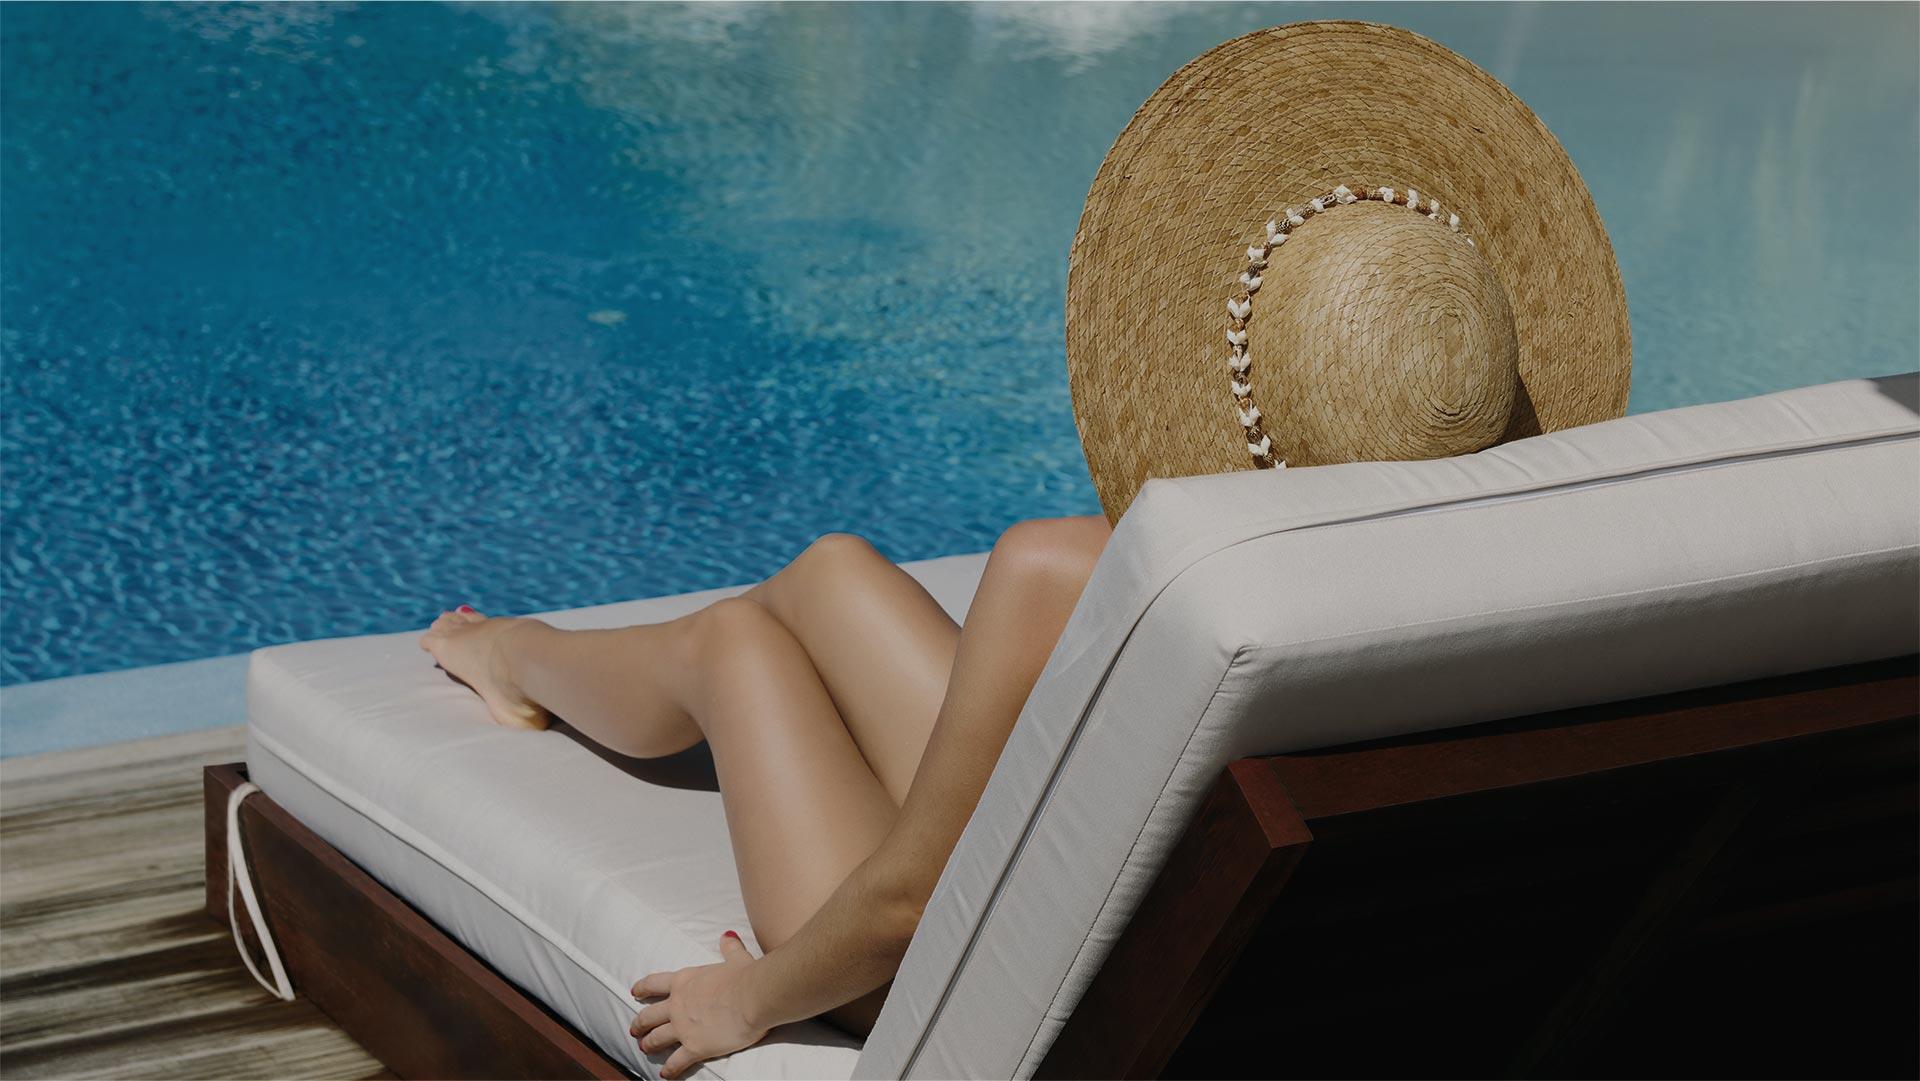 Sundial Beach Resort & Spa - Sanibel Island Hotel | Florida Resort Vacation